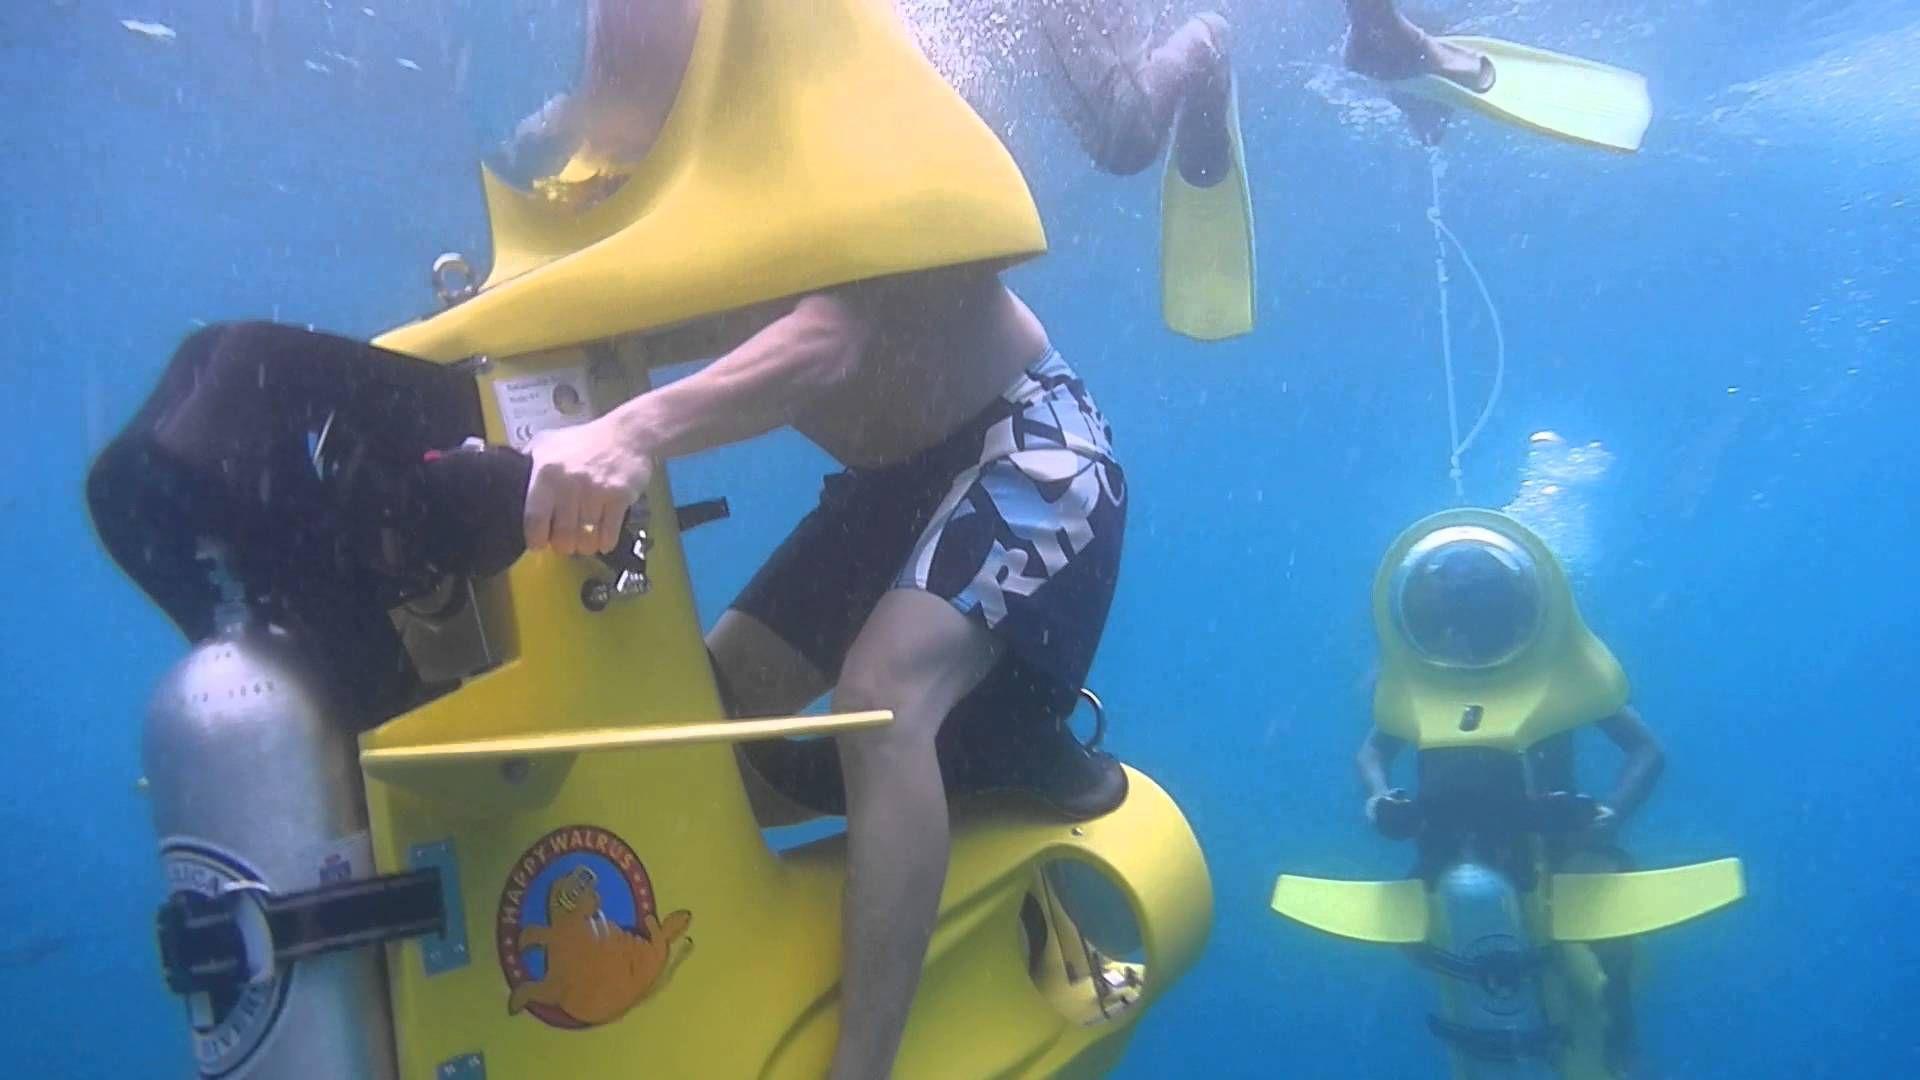 Bali Underwater Scooter at Lembongan Island Bali